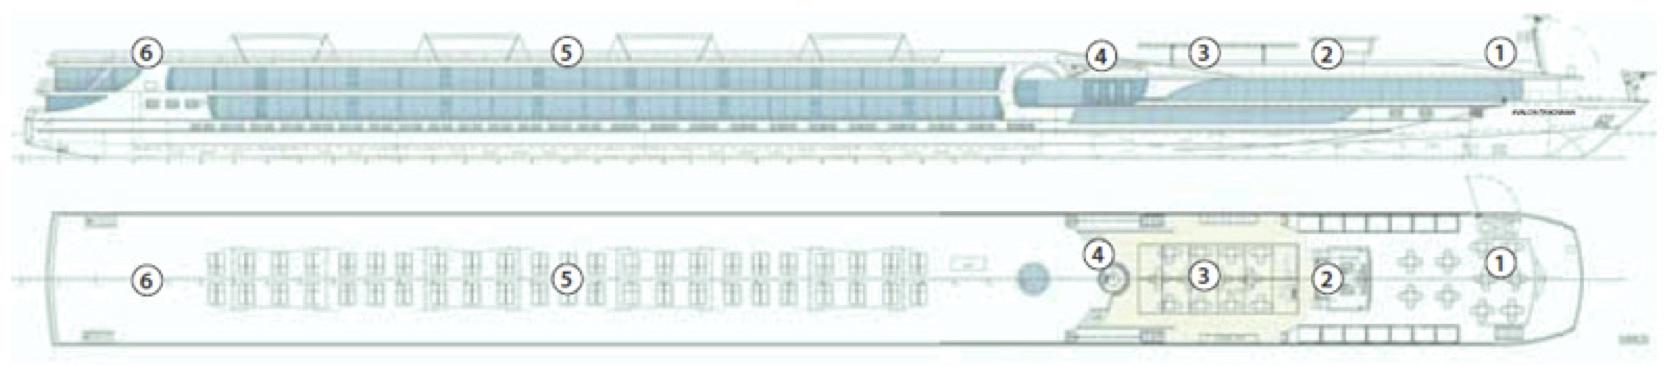 Avalon Vista-deckplan-Sky Deck